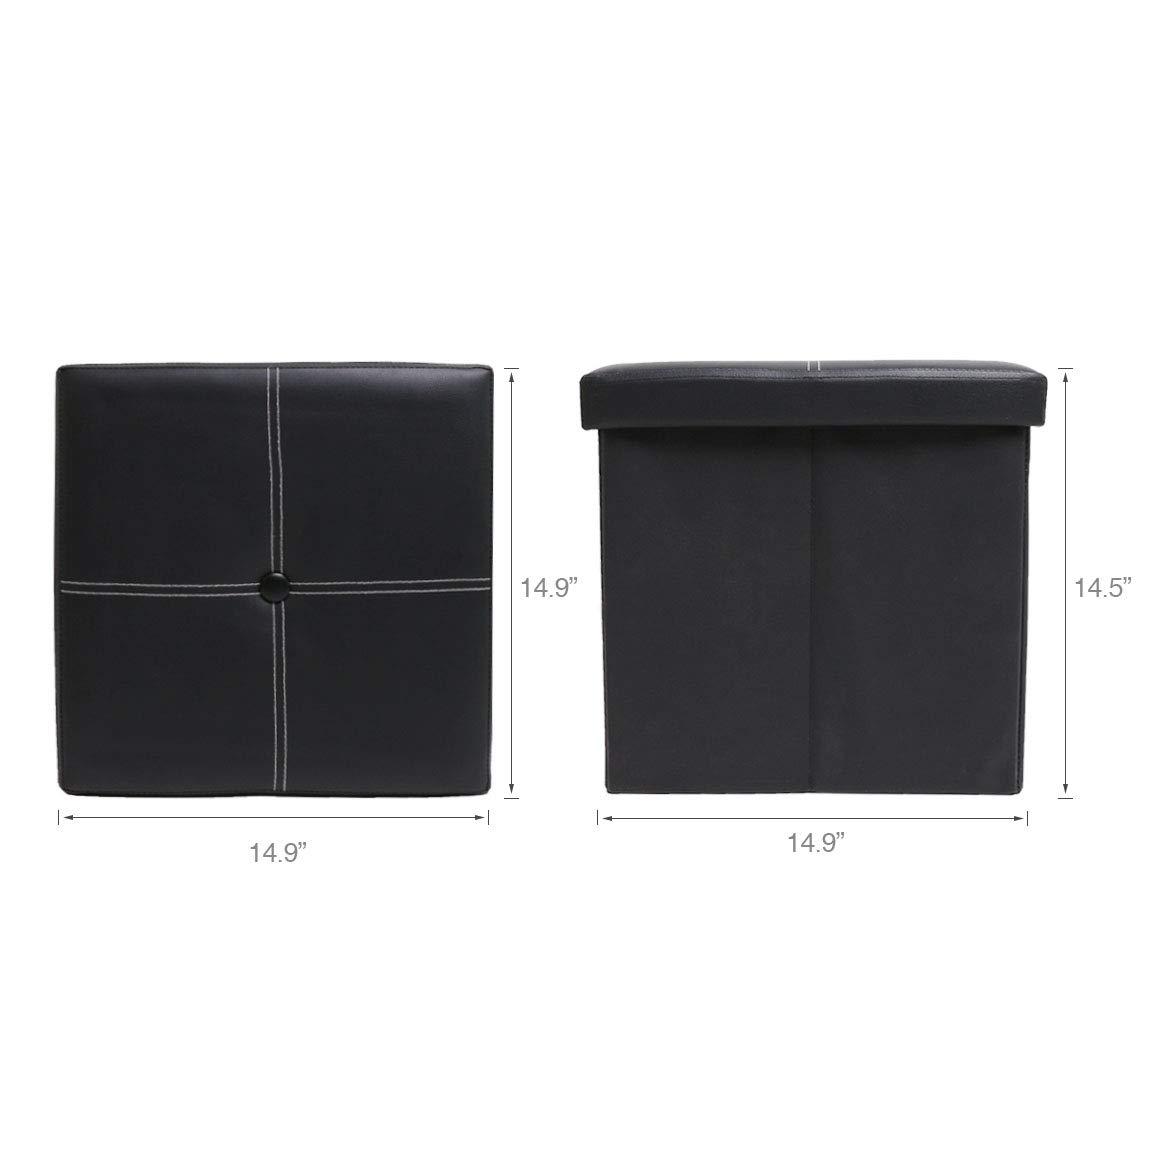 SZAT PRO Grey Faux Leather Cube Storage Ottomans 12 inch